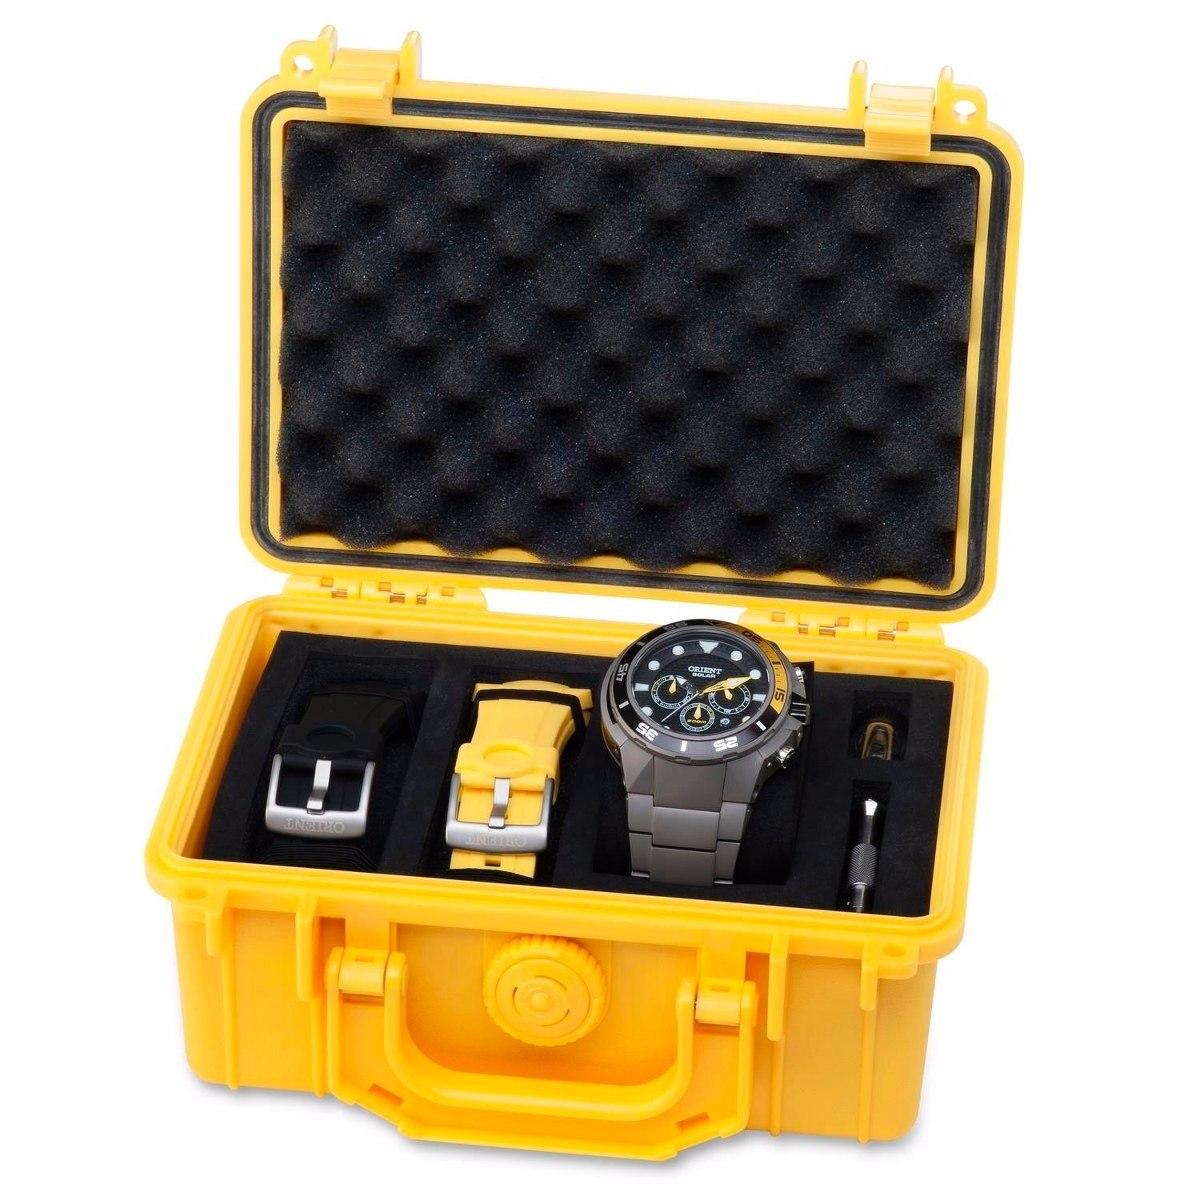 5fcc6c1cc92 Relógio Orient Masculino Seatech 500m Mbttc014 Solar Titanio - R ...